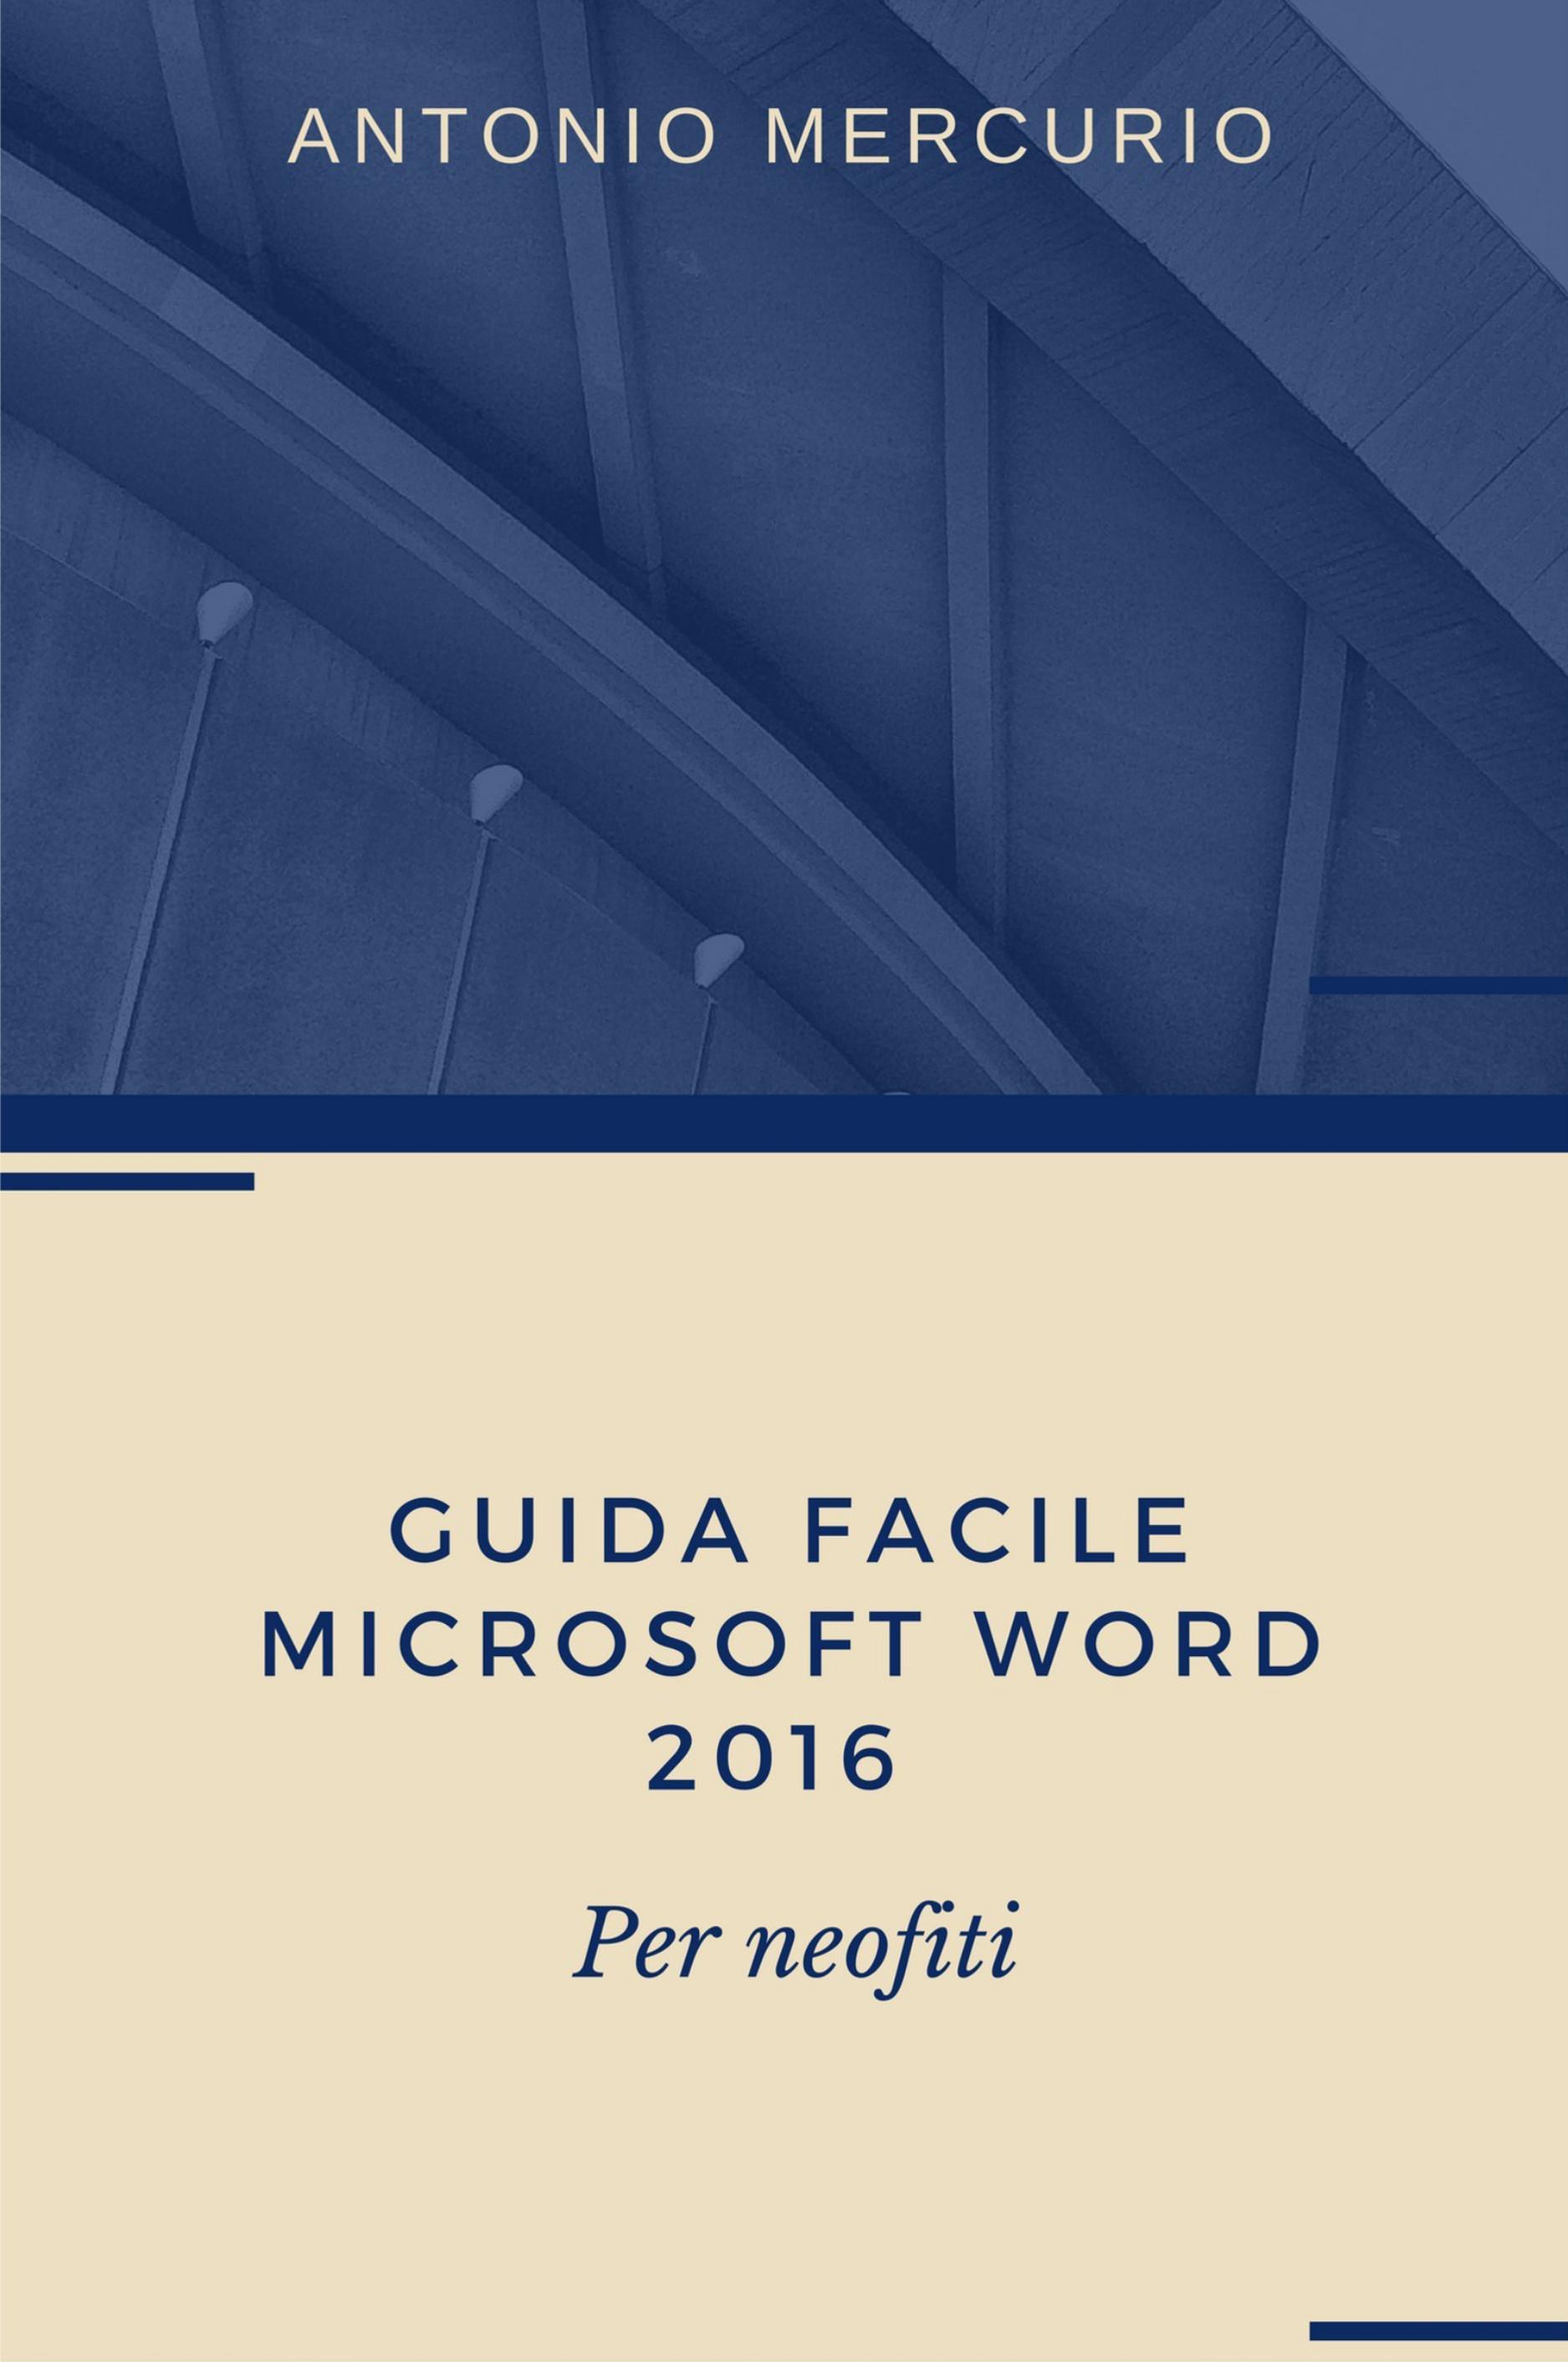 Guida facile di Microsoft Word 2016